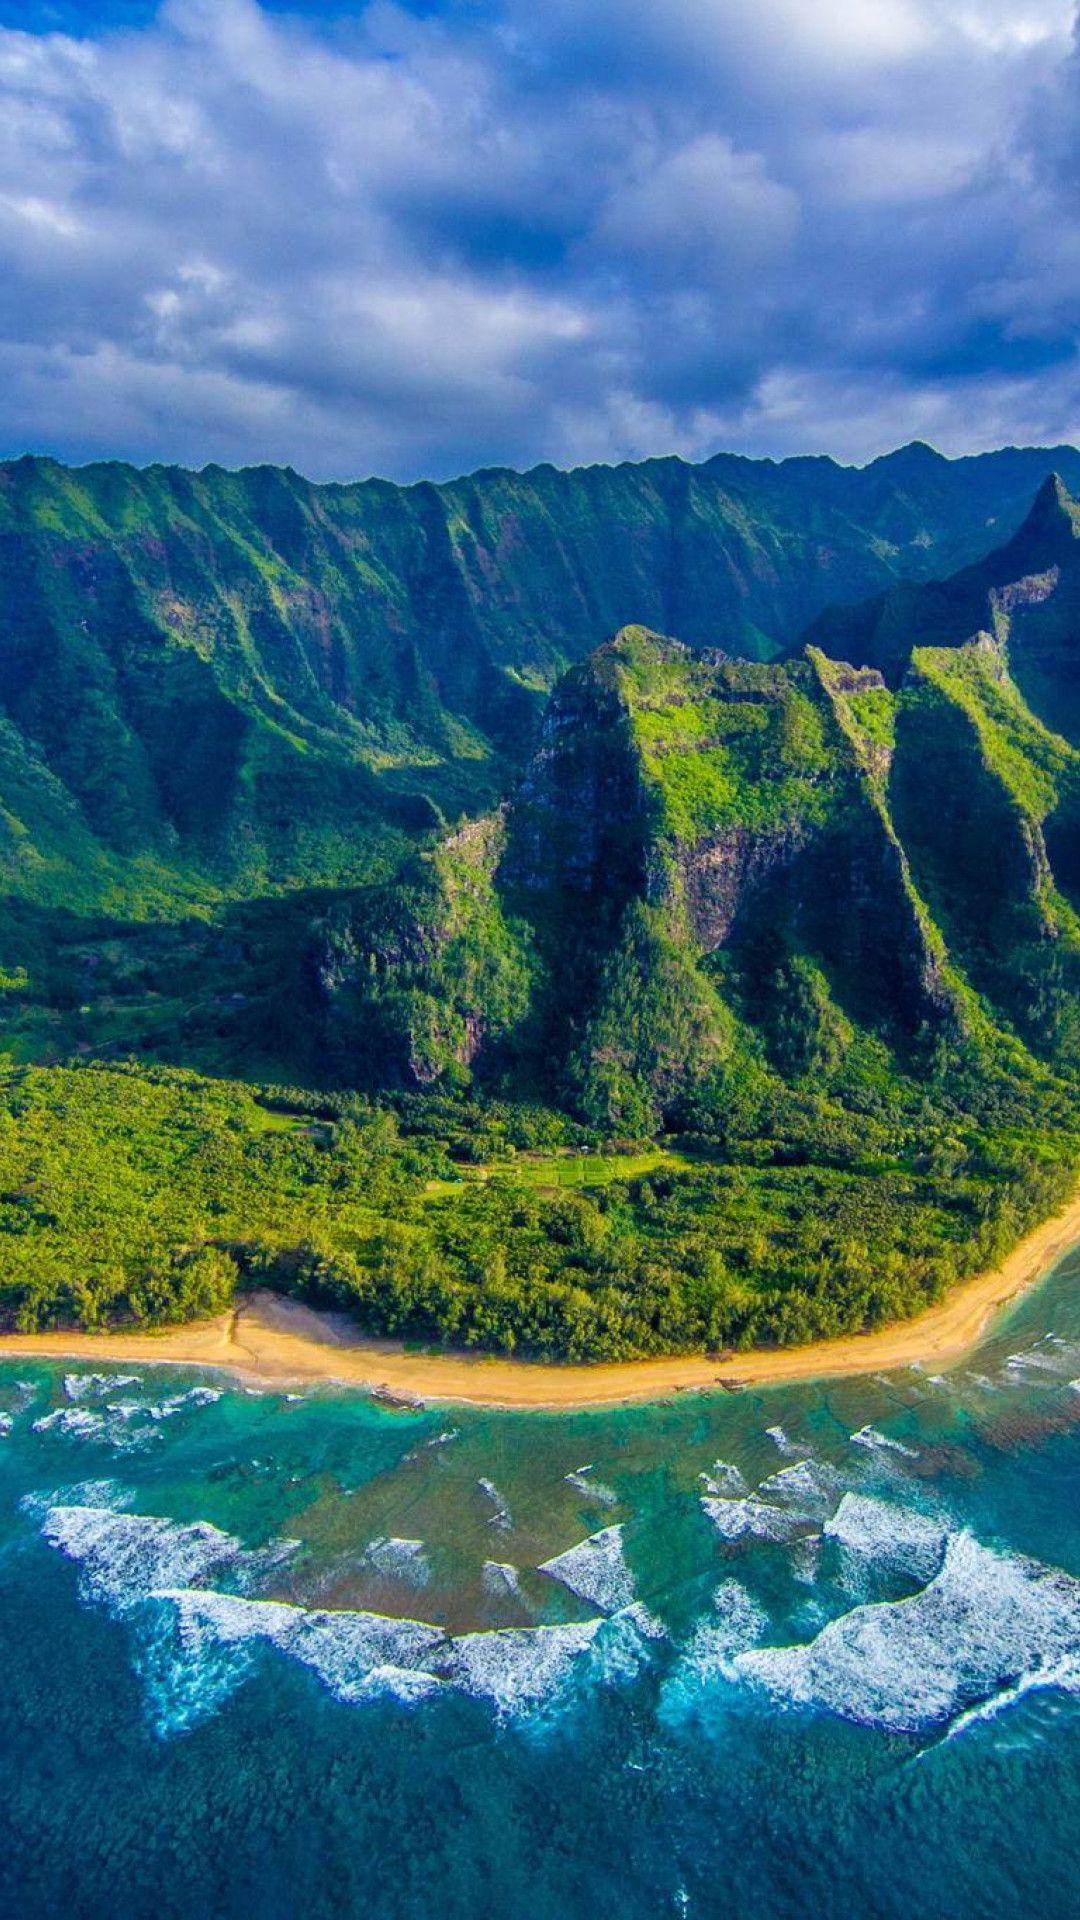 768x1280 Free Hd Hawaii Beach Wallpapers Download